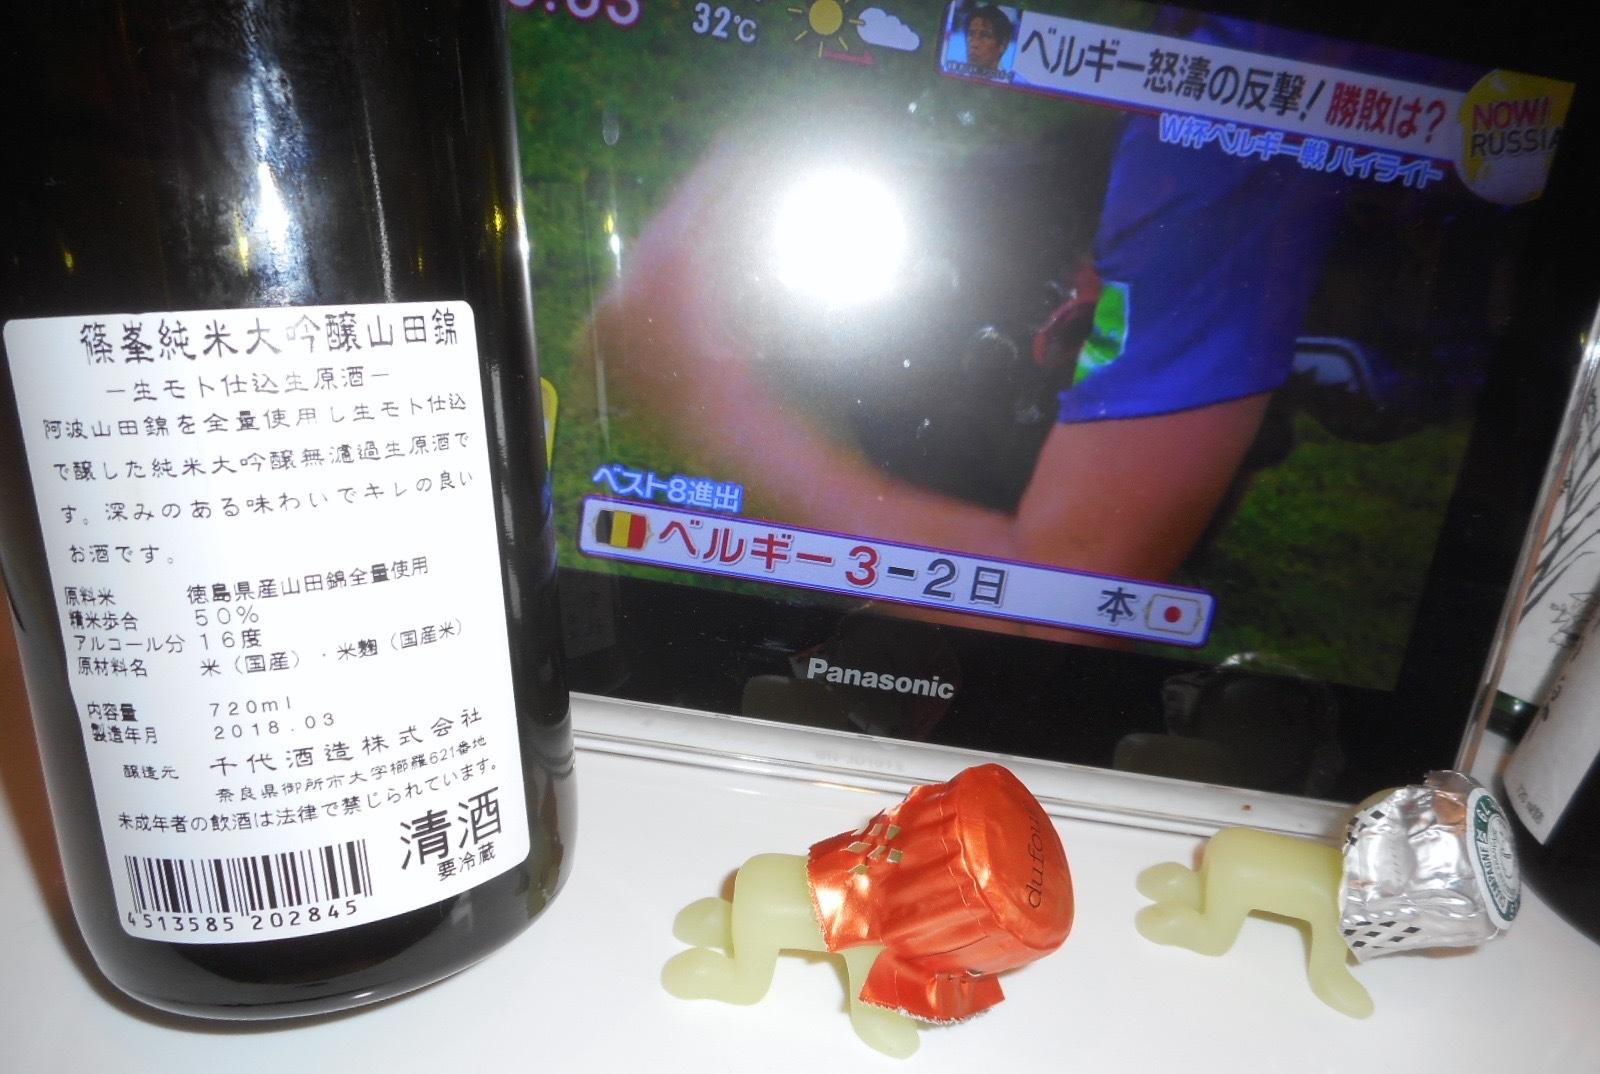 shinomine_kimoto_jundai29by2.jpg